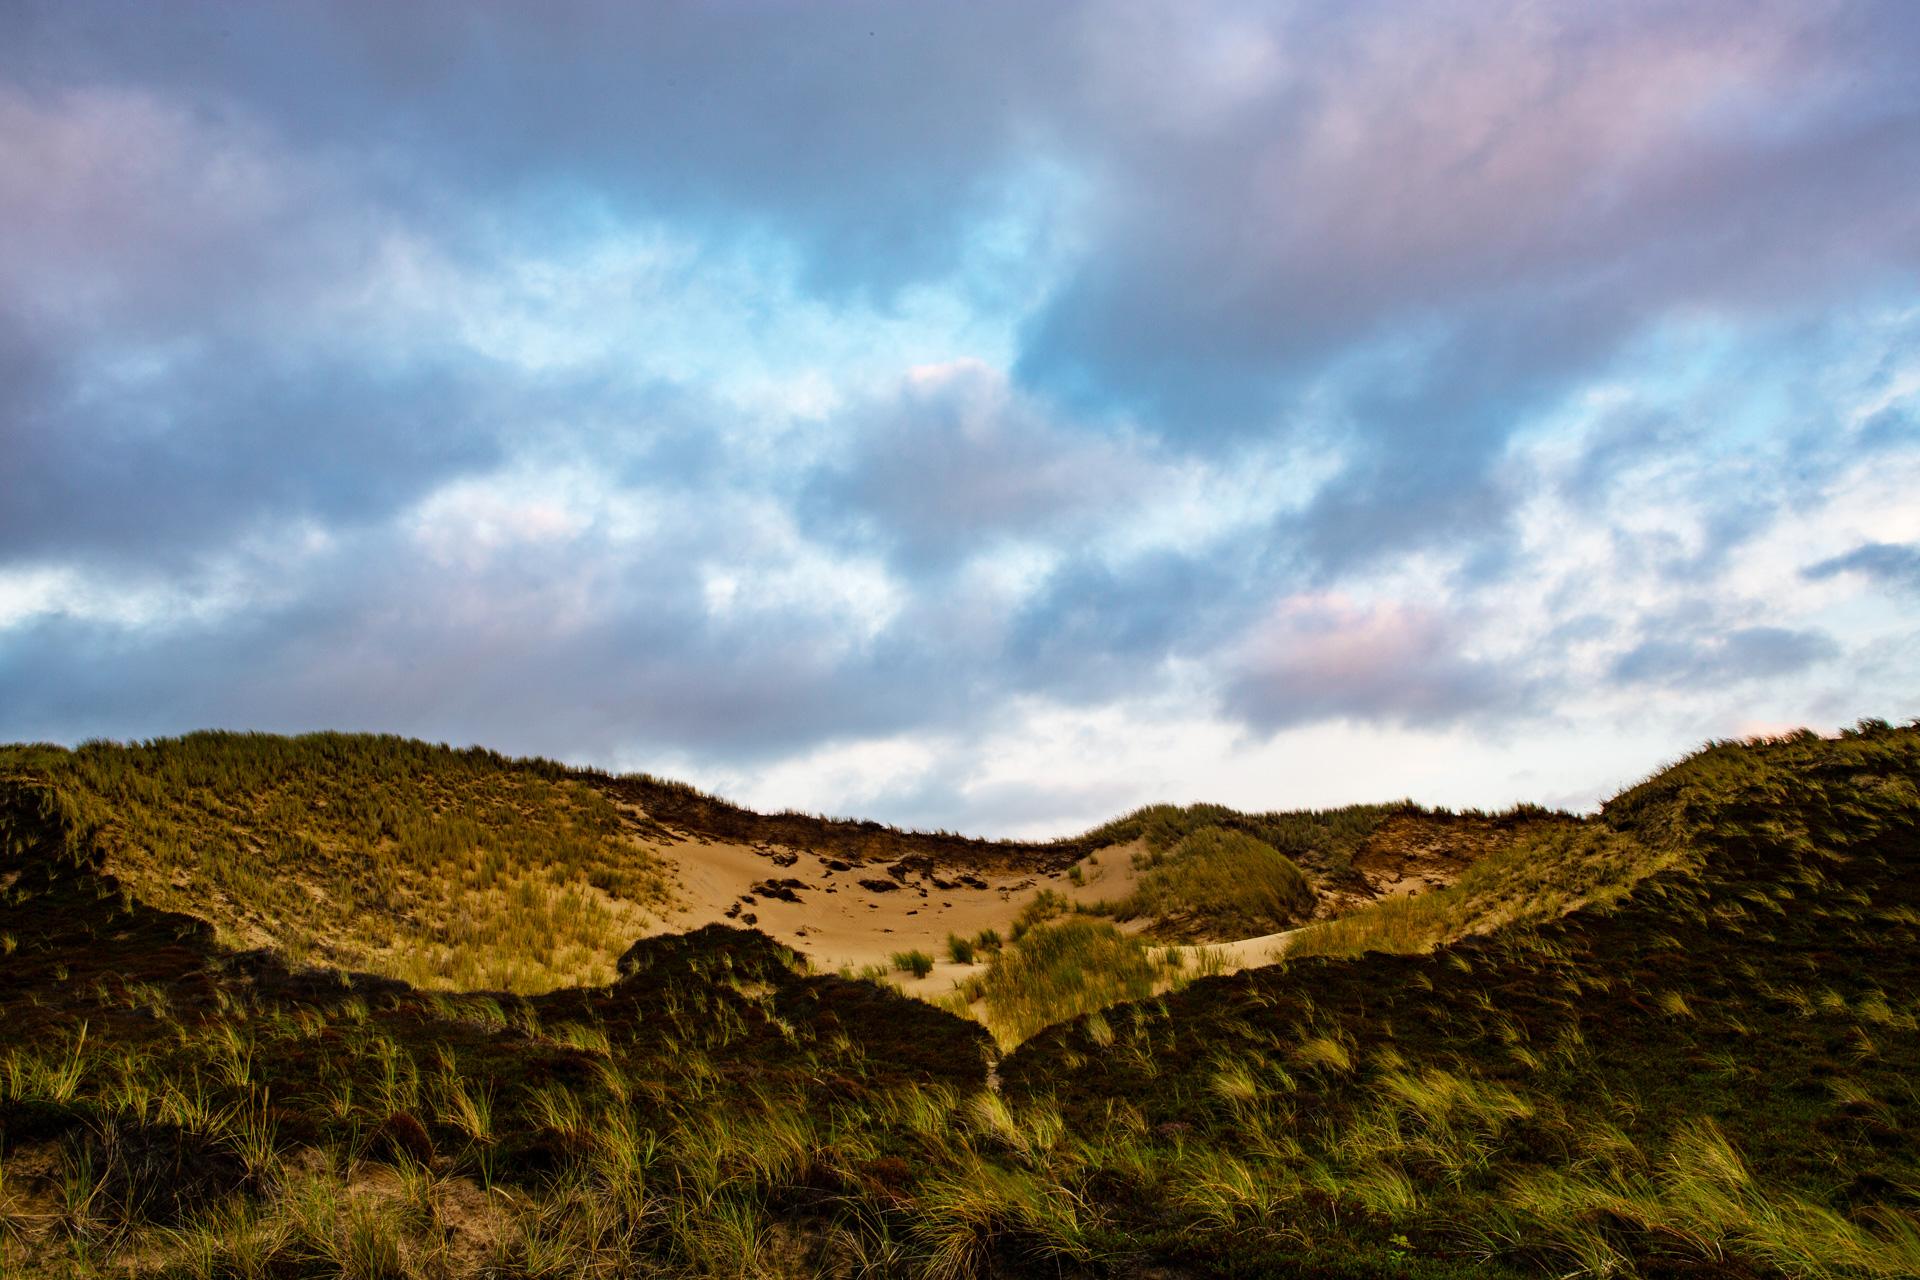 Sylter Dünenlandschaft - Dünen auf der Insel Sylt - Leinwandbild - EMOZION